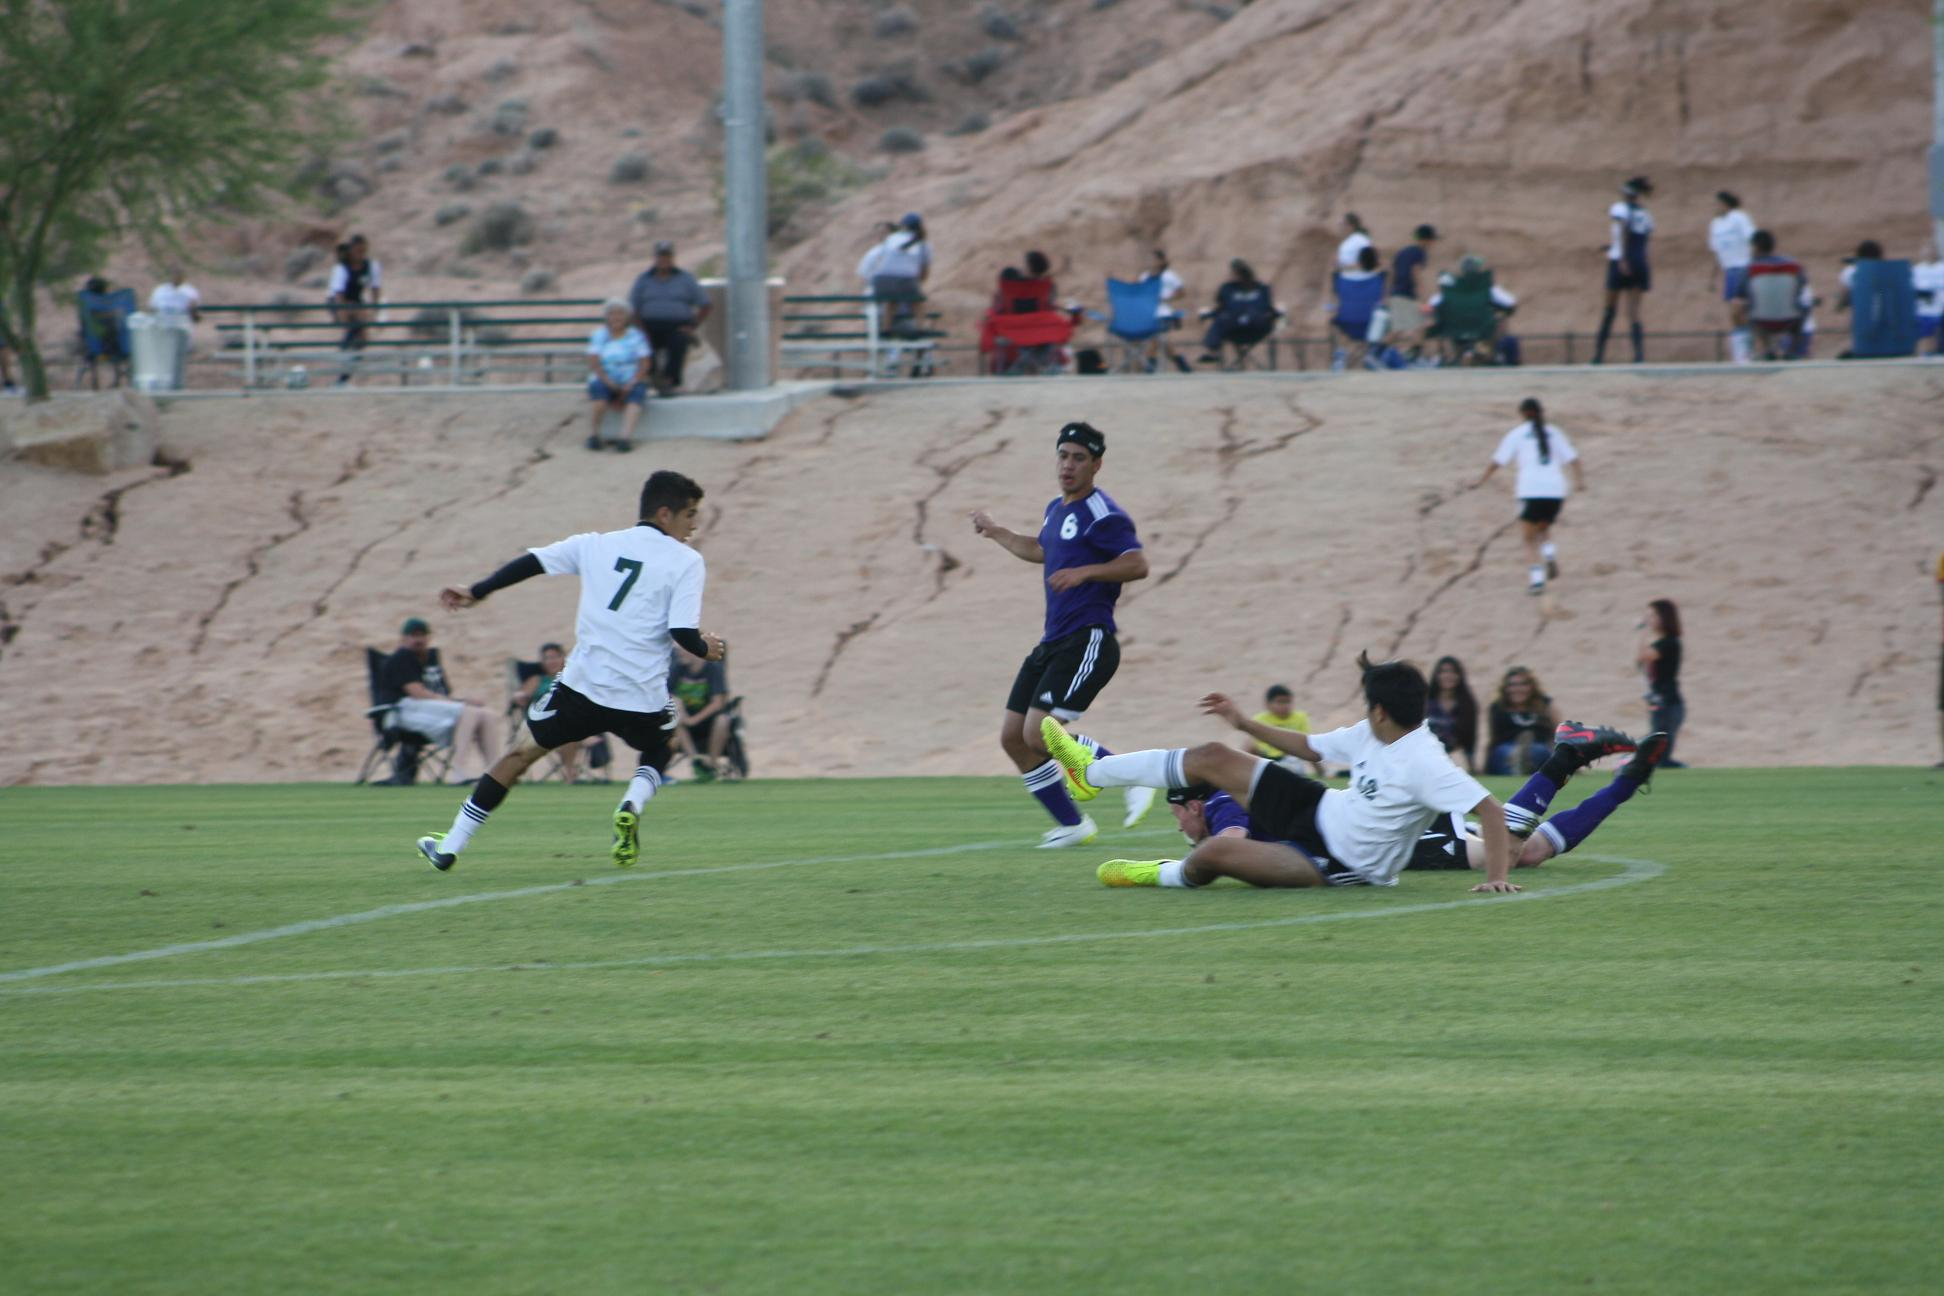 Bulldog boy soccer team places third at Mesquite Cup